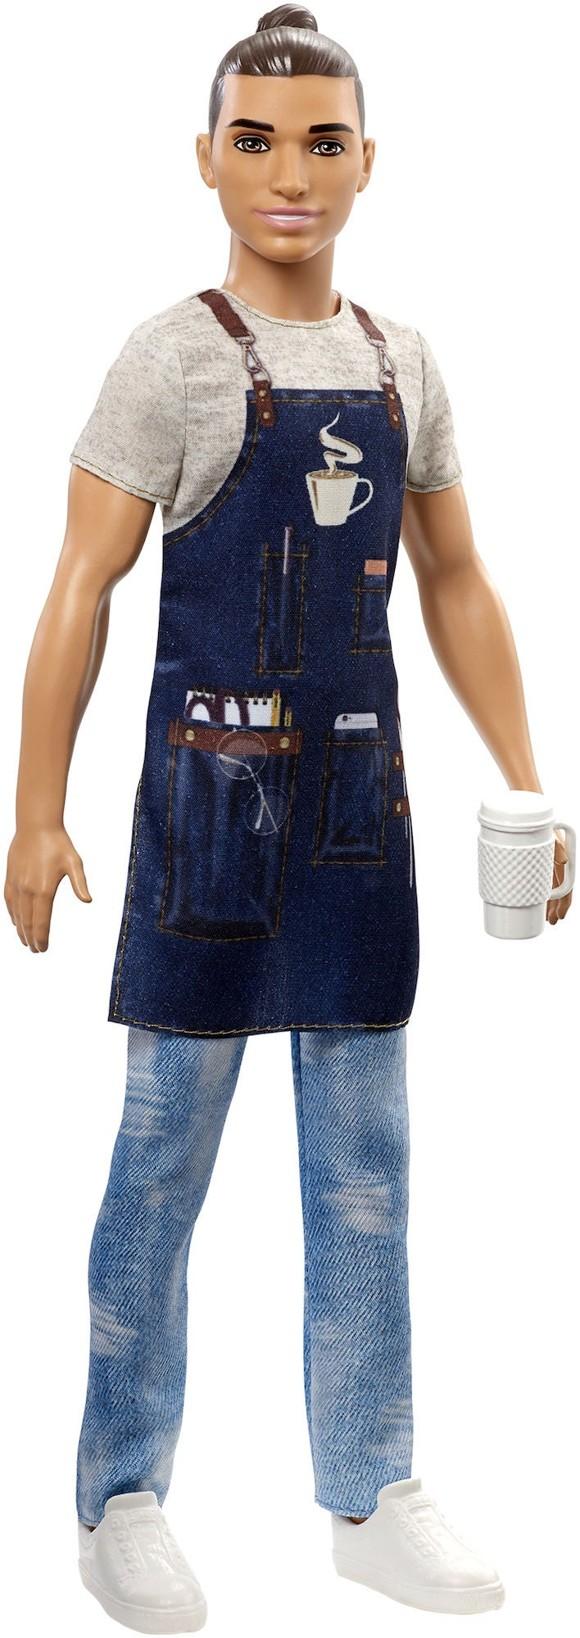 Barbie - Ken Karriere Dukke - Barista Ken